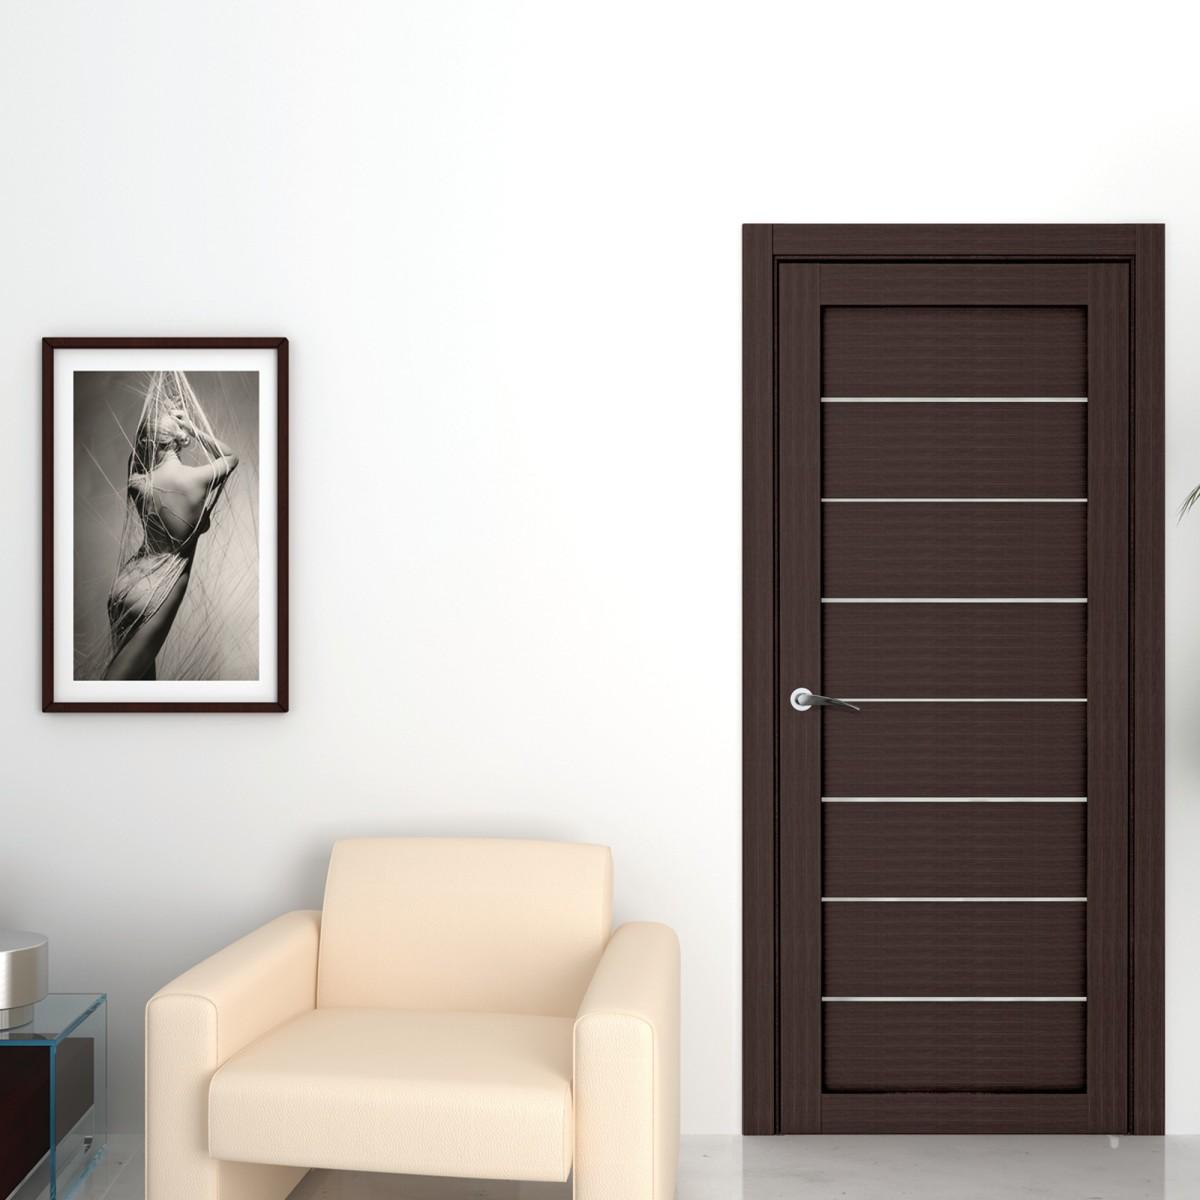 Дверь Межкомнатная Глухая Сабрина 70x200 Ламинация Цвет Мокко С Фурнитурой